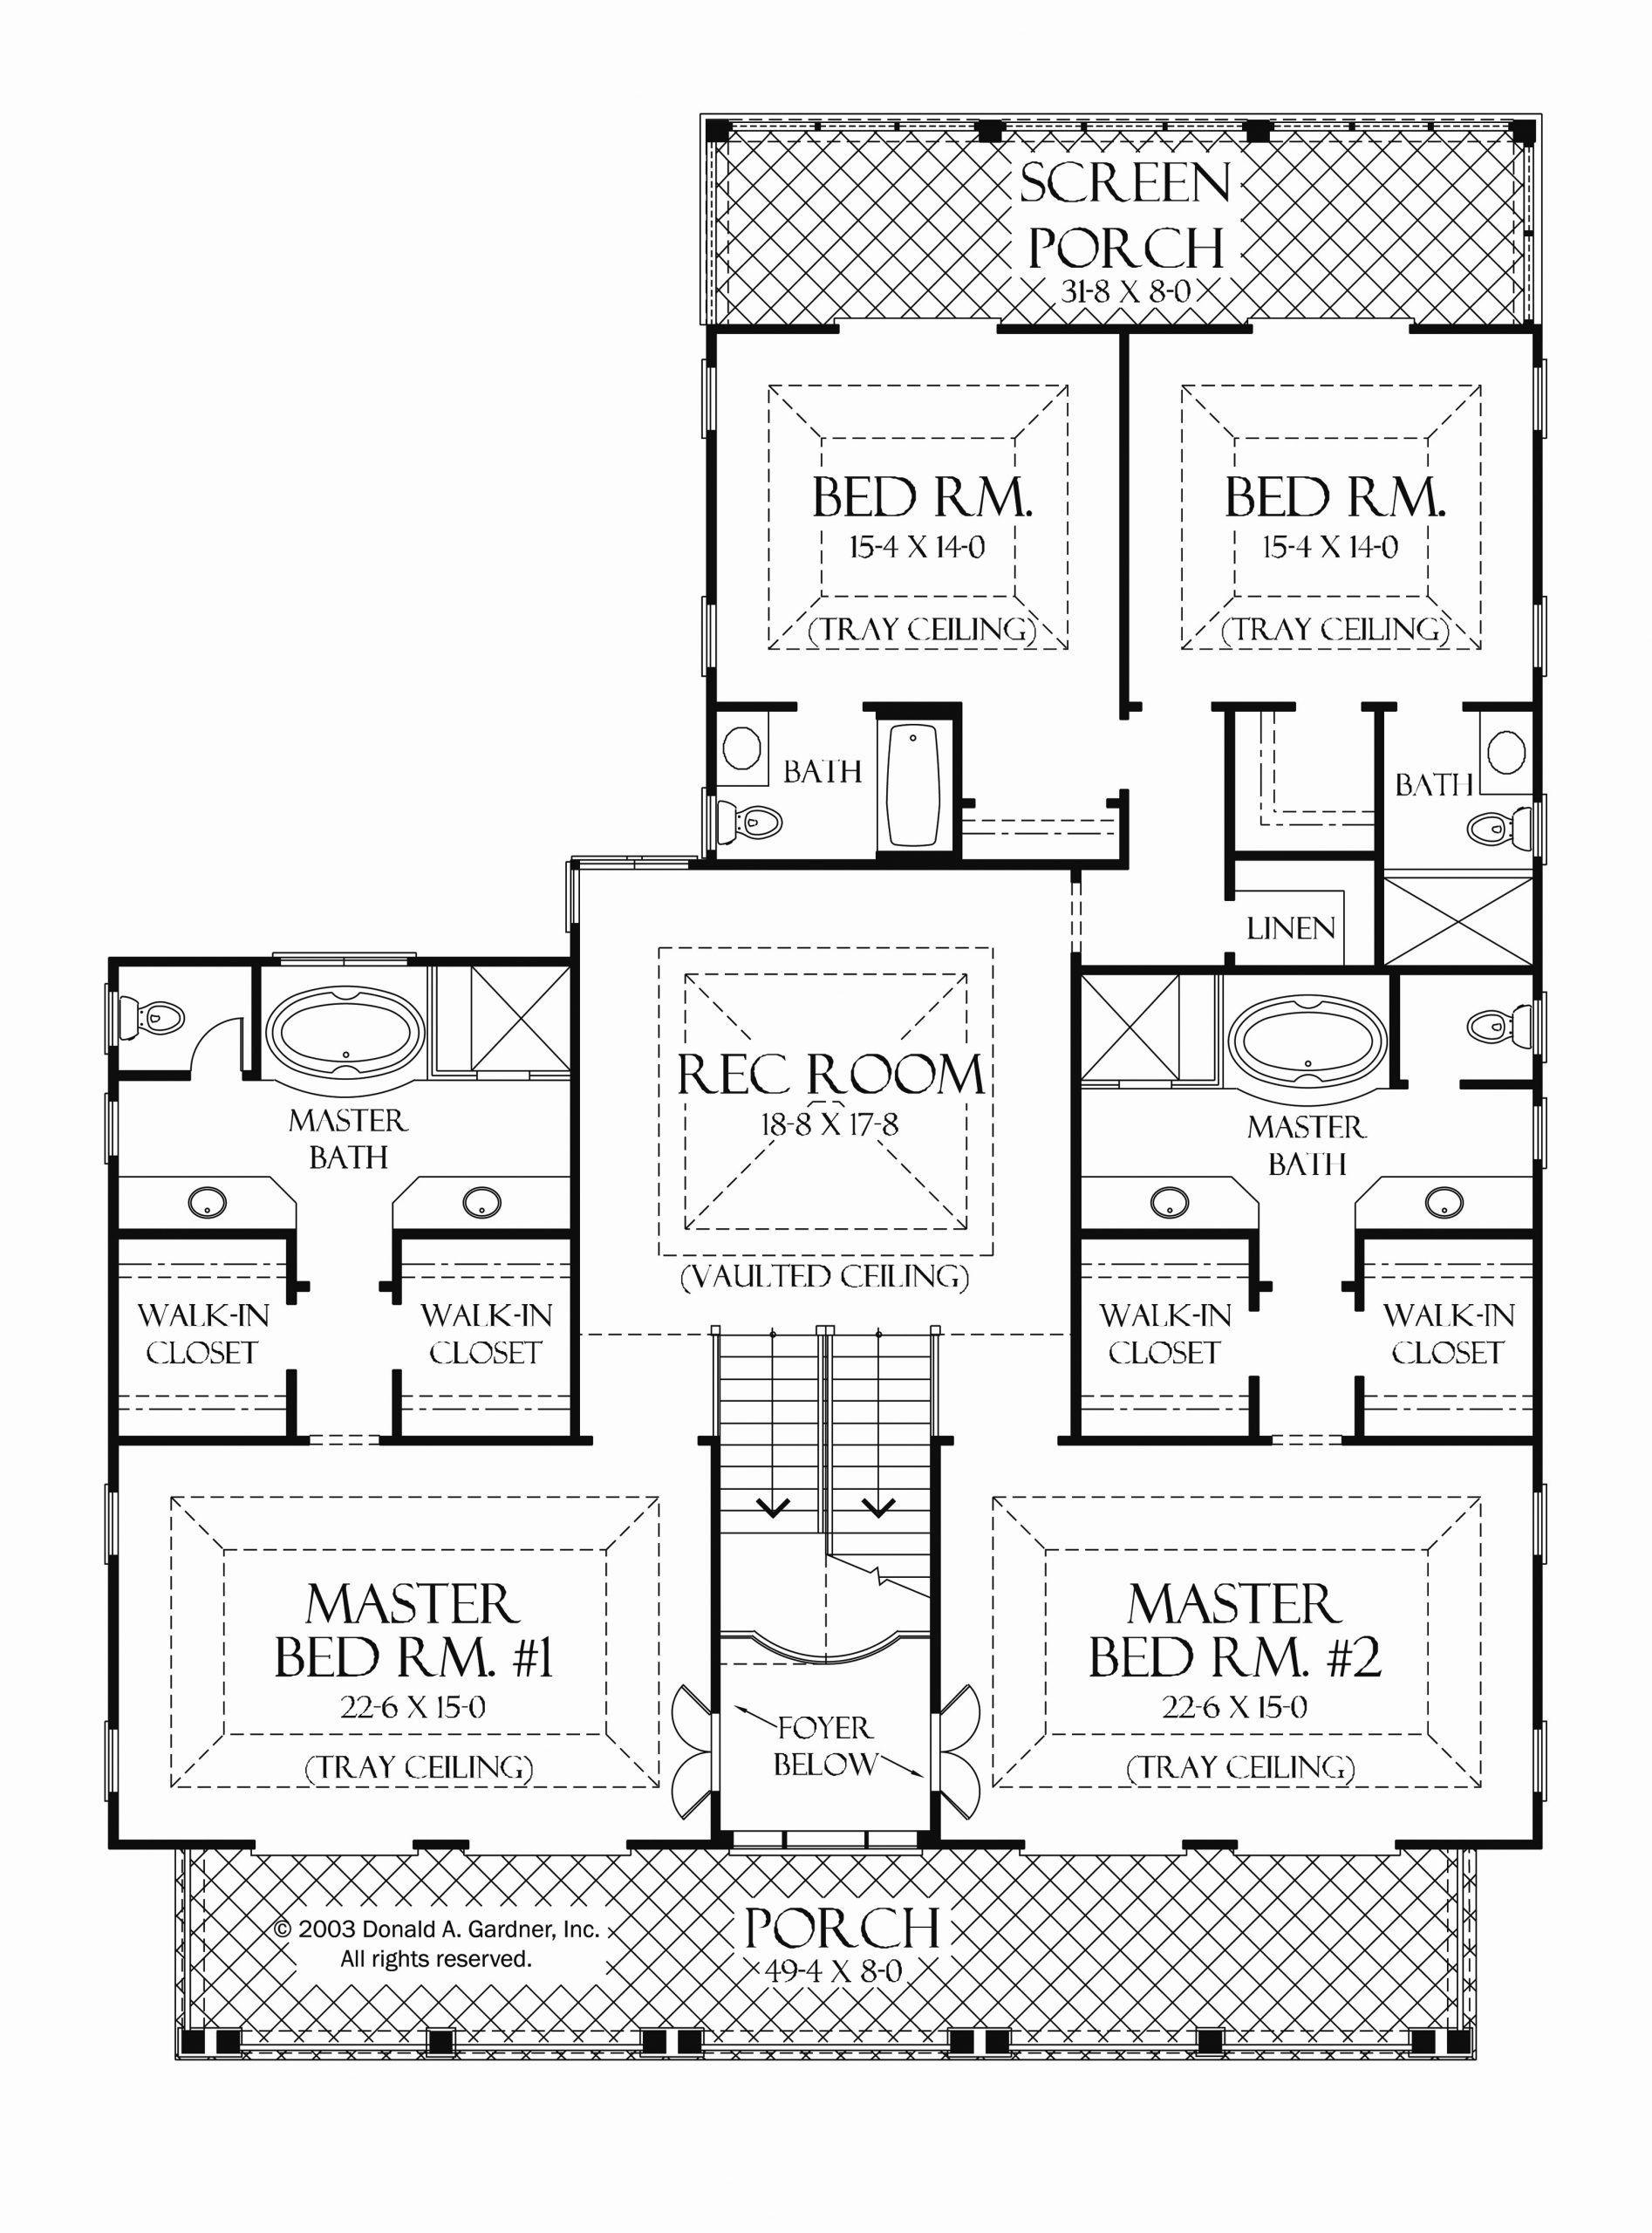 Dual Master Bedroom House Plans New E Story House Plans With Two Master Suites Luxury 13 House Bedroom House Plans Bedroom Floor Plans Master Bedroom Bathroom